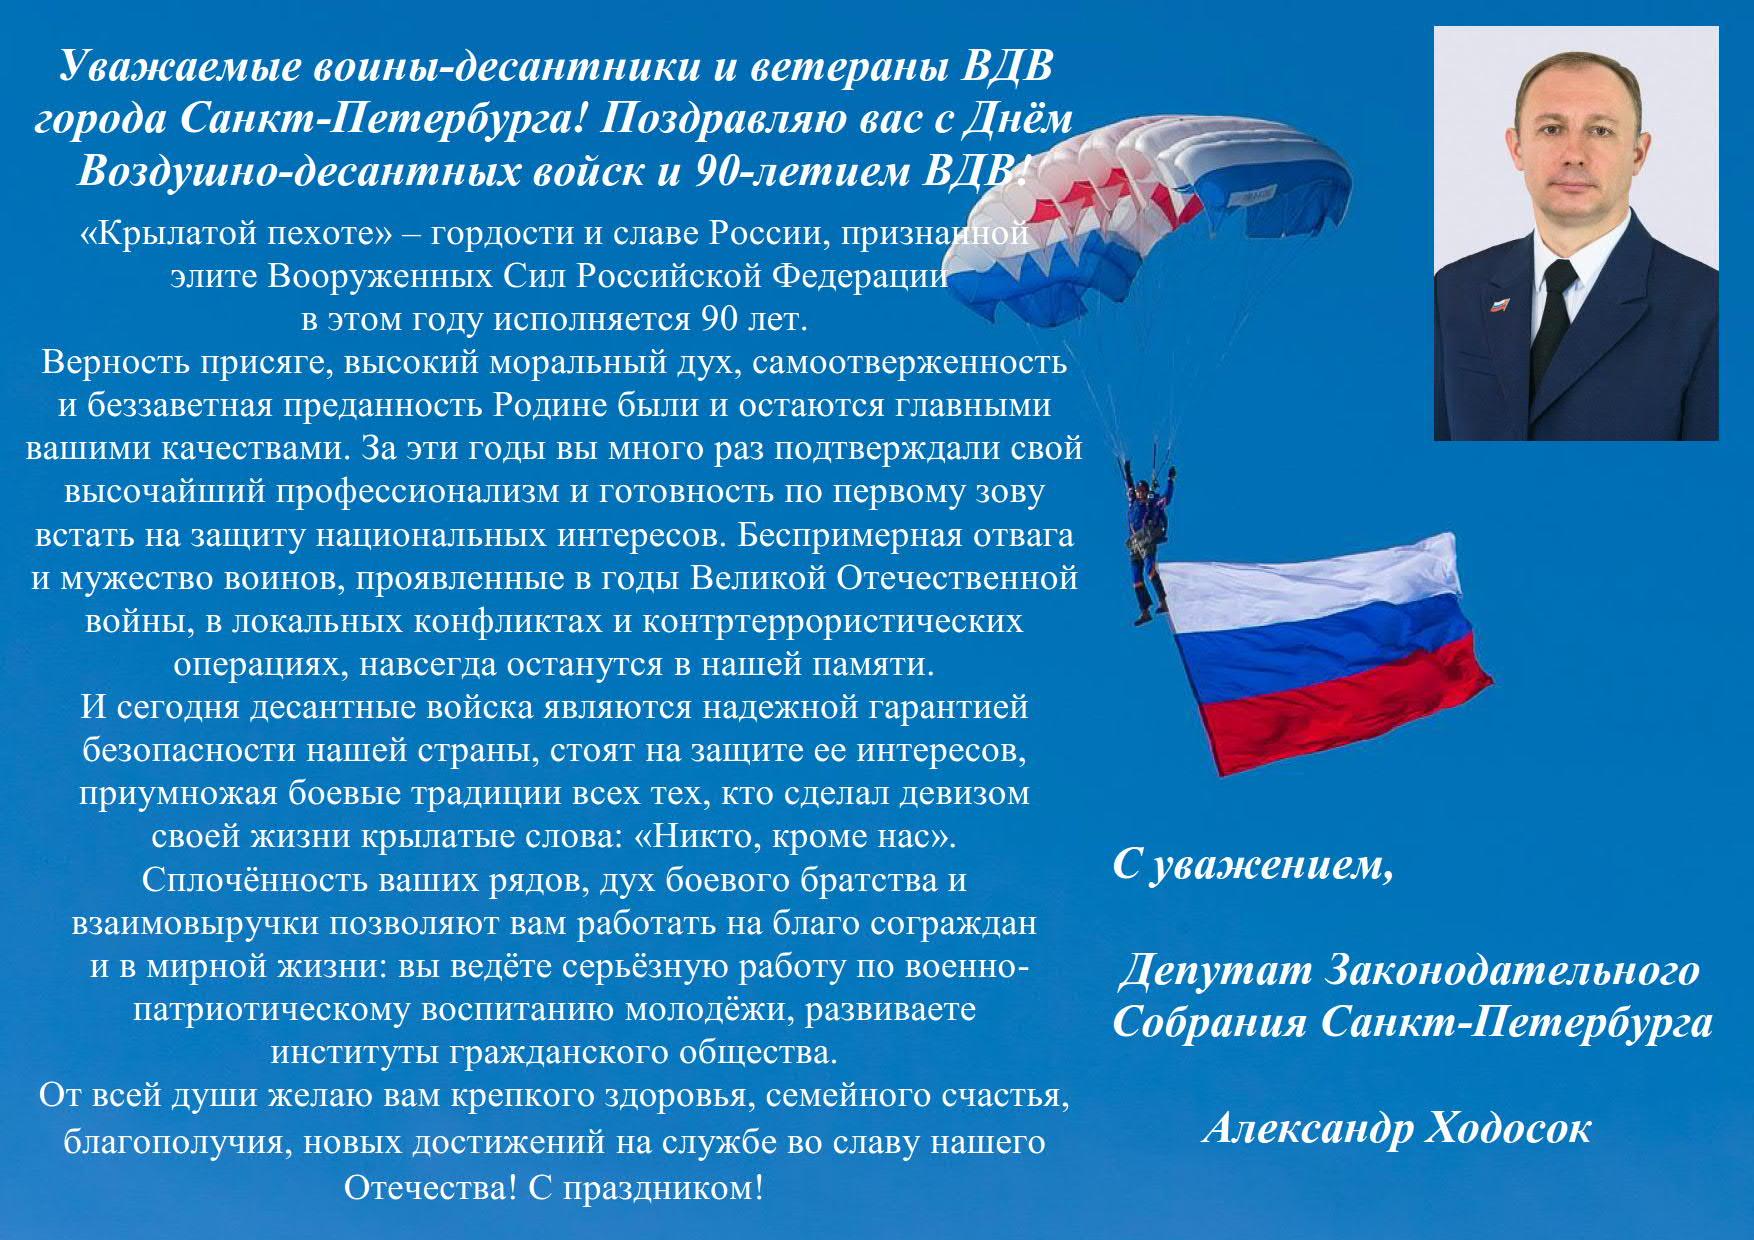 ПОЗДРАВЛЕНИЕ А.В. Ходоска с Днем ВДВ..._1